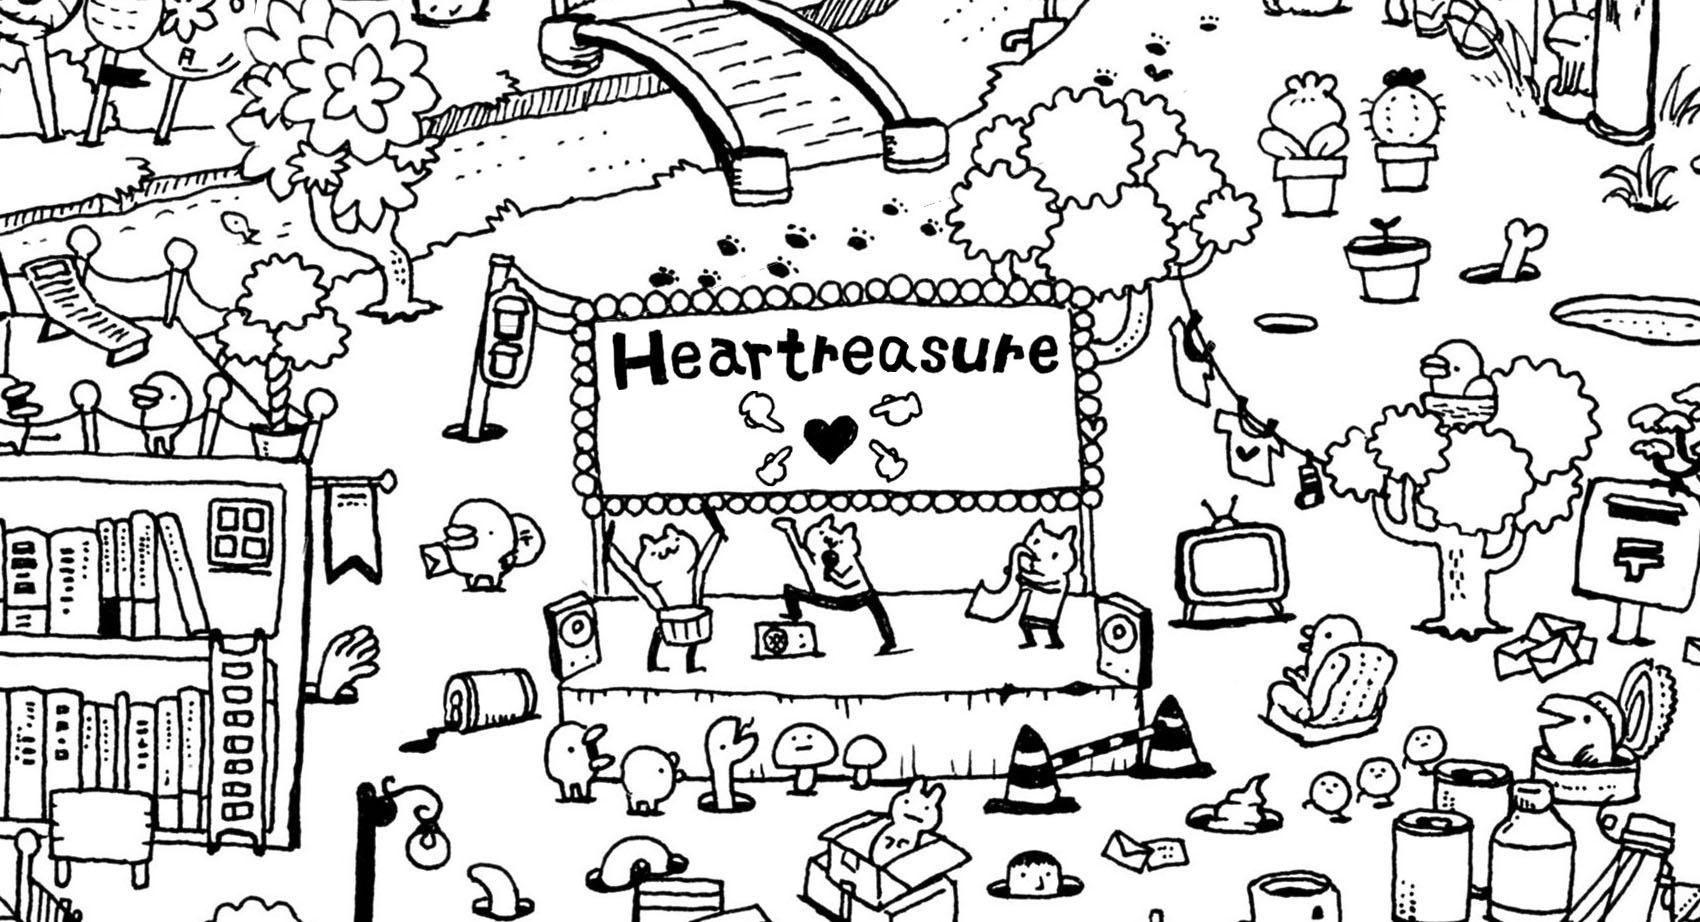 Heartreasure